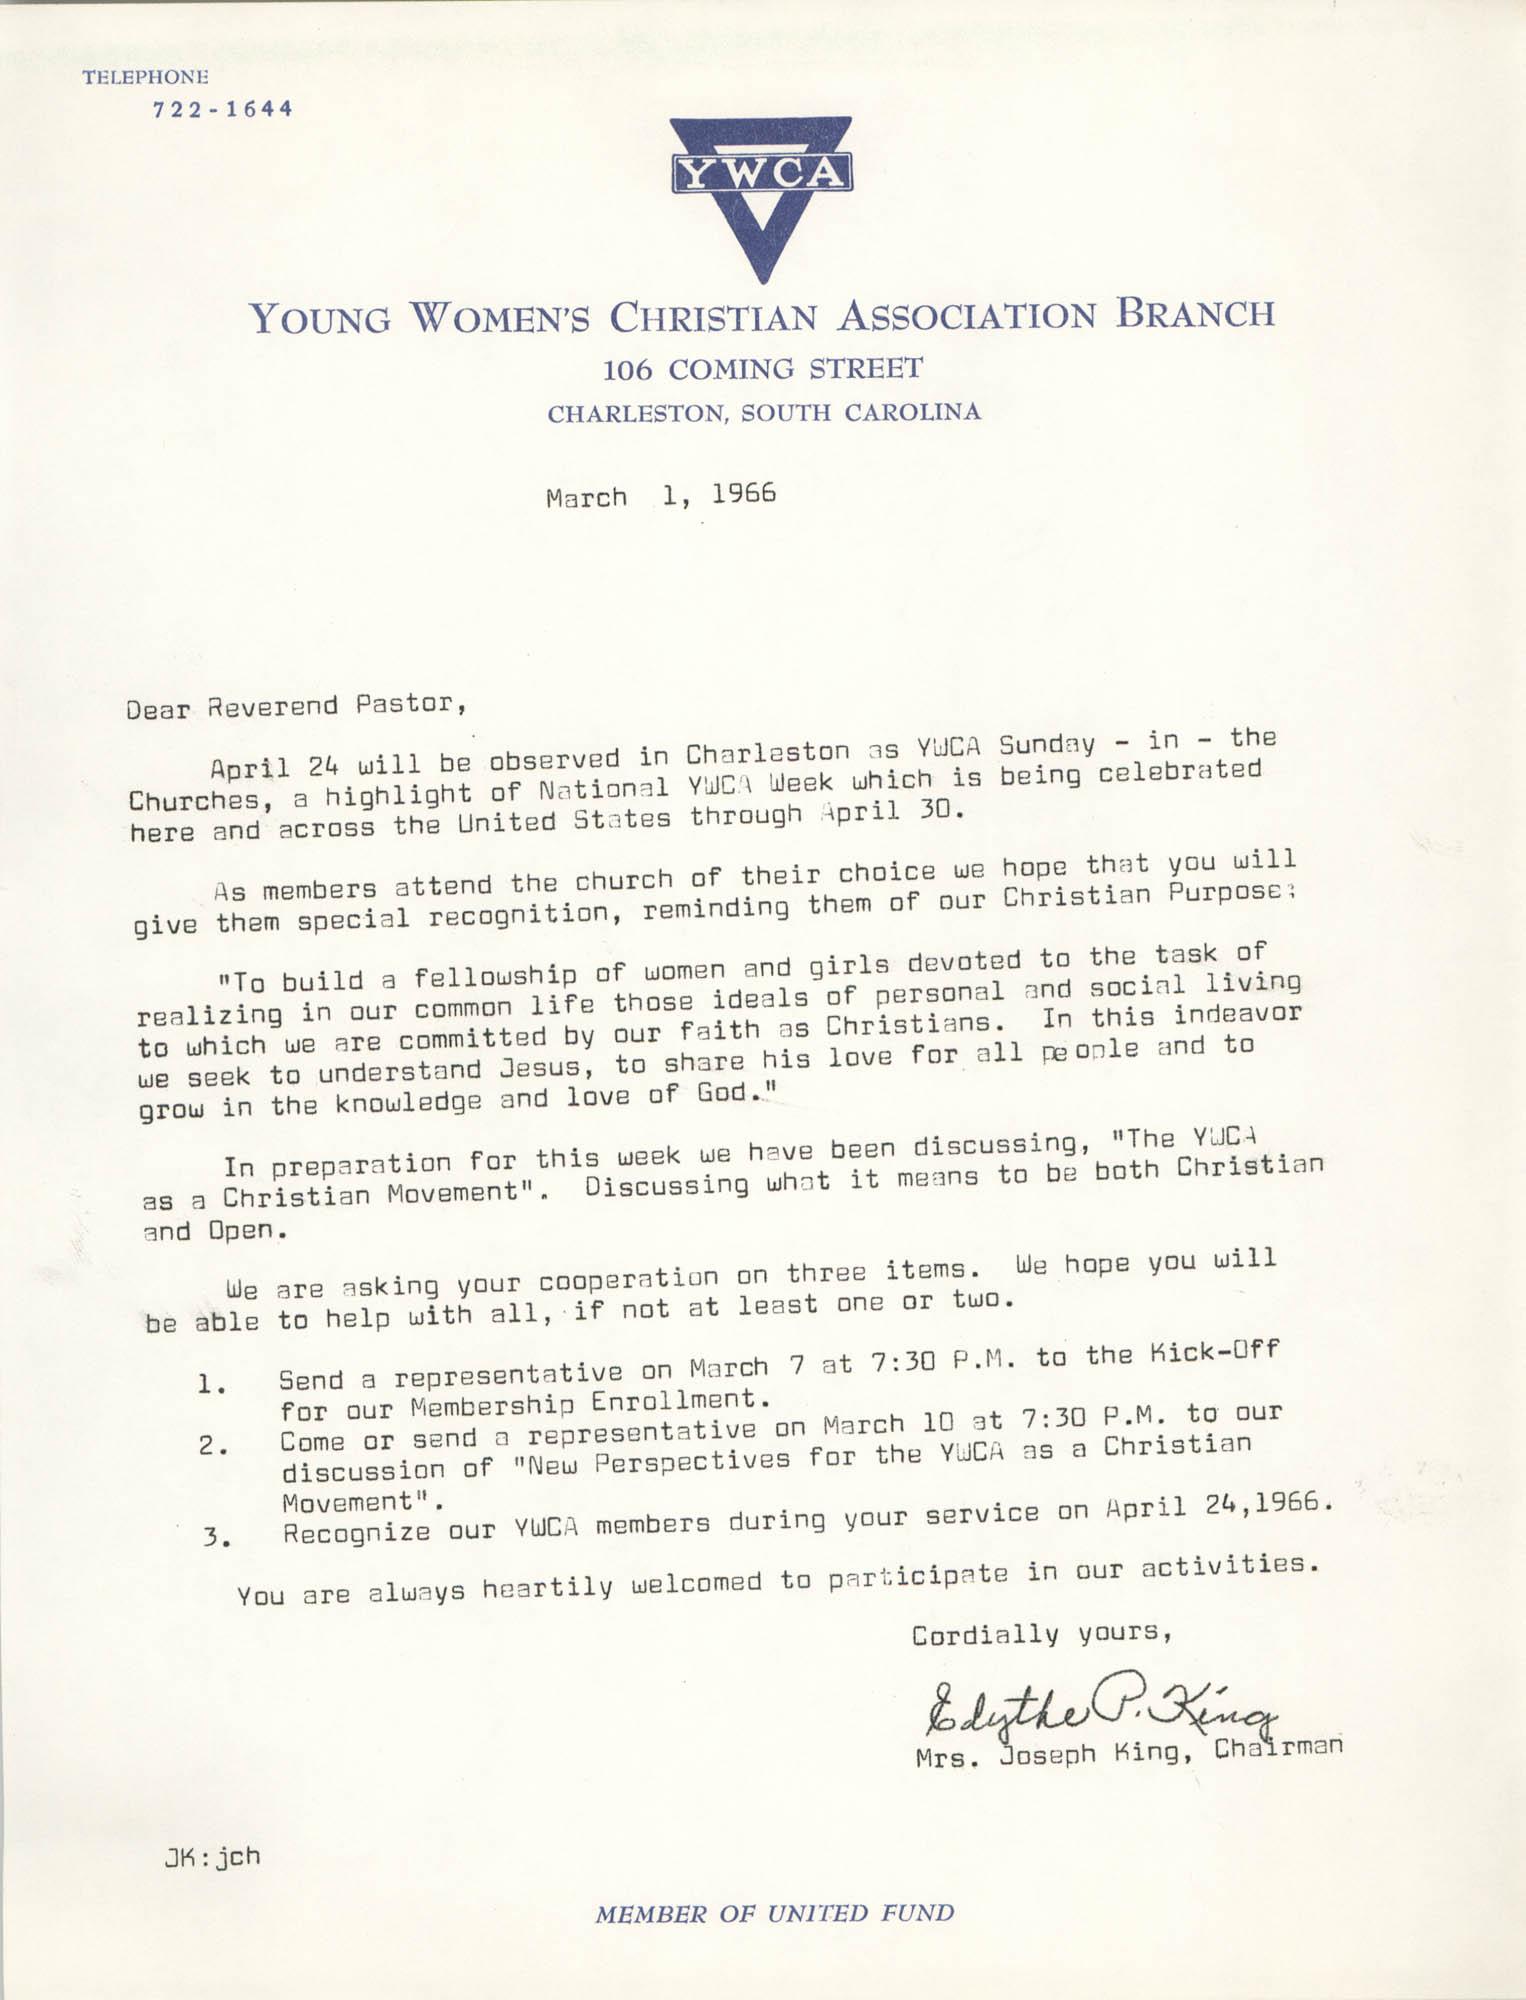 Letter from Mrs. Joseph King to